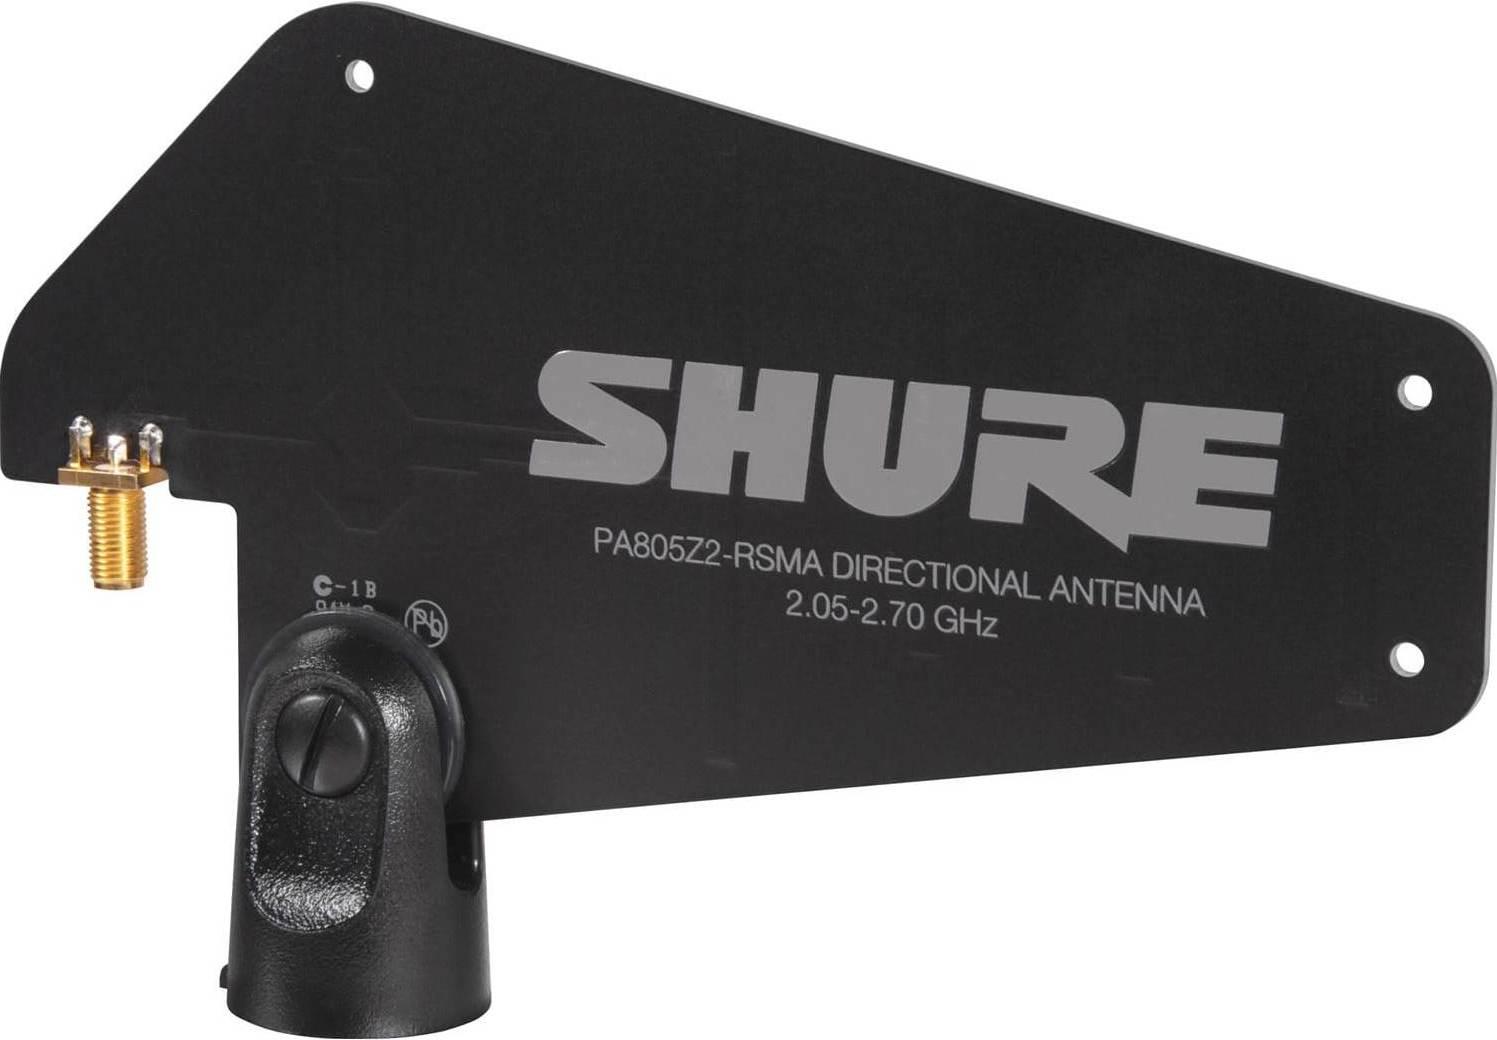 Пассивная антенна Shure PA805Z2-RSMA